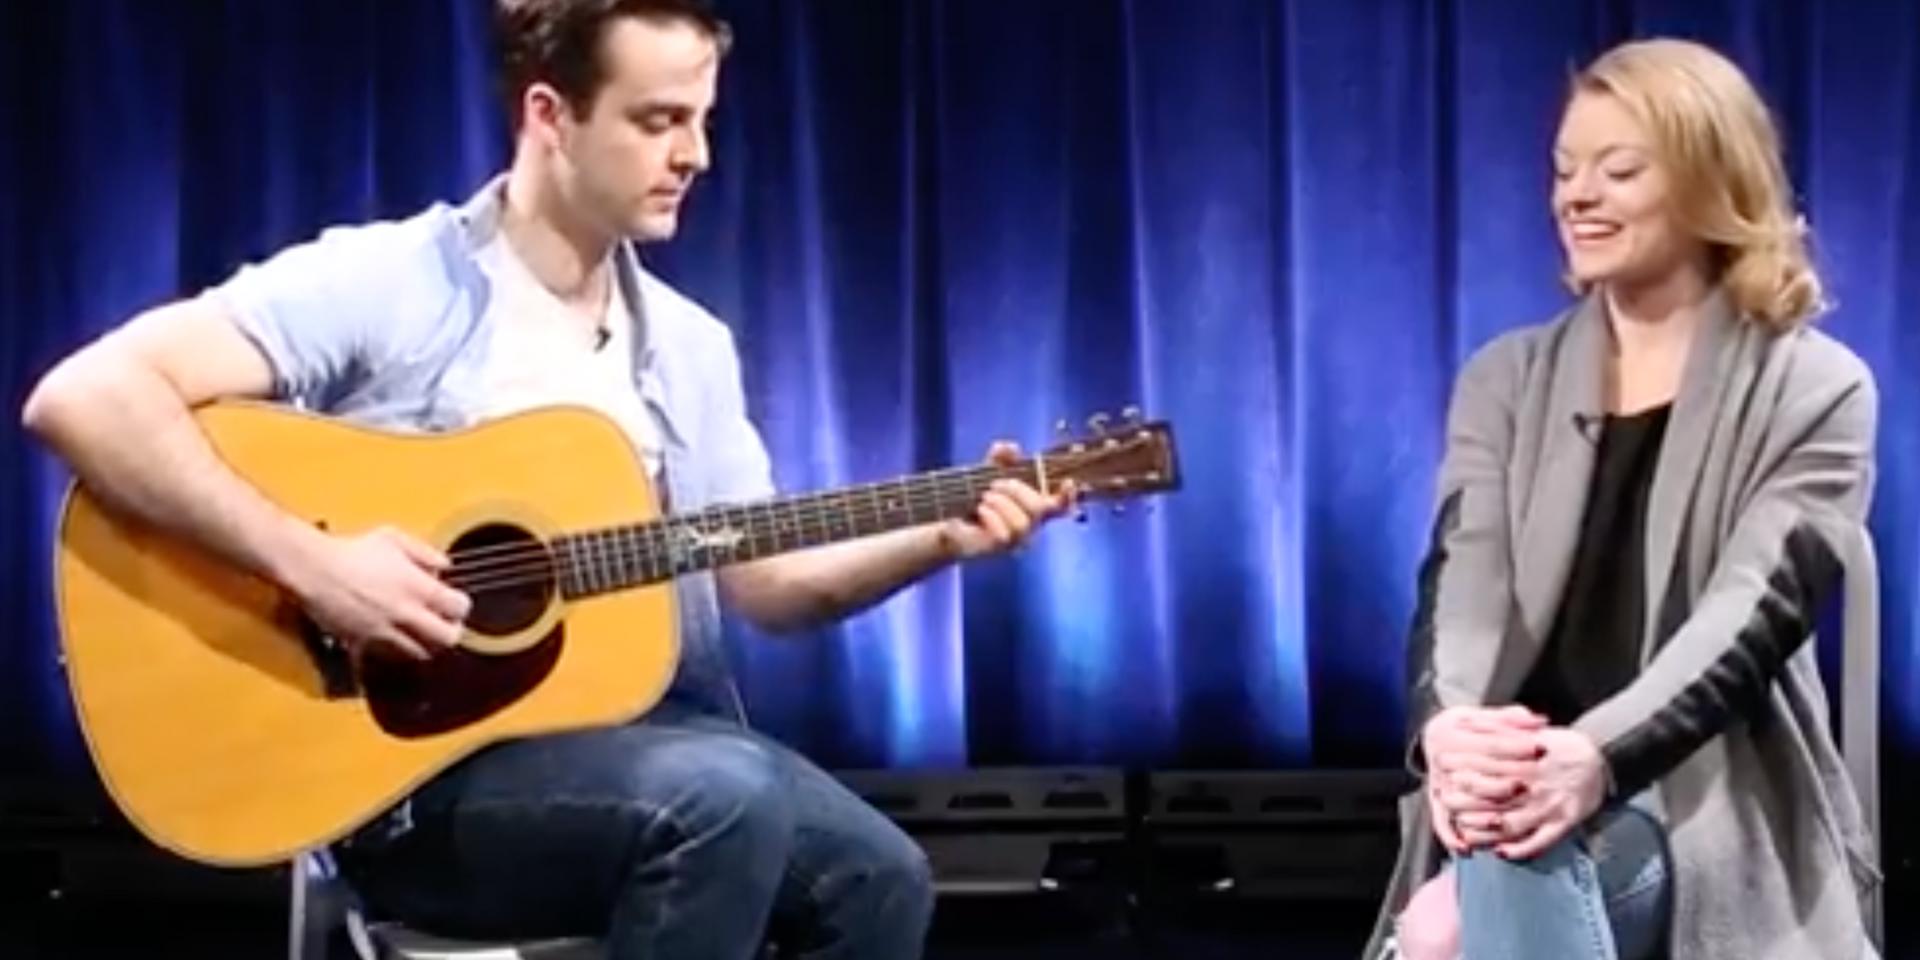 Ruby Lewis & Ryan Vona Sing 'Everything' Unplugged